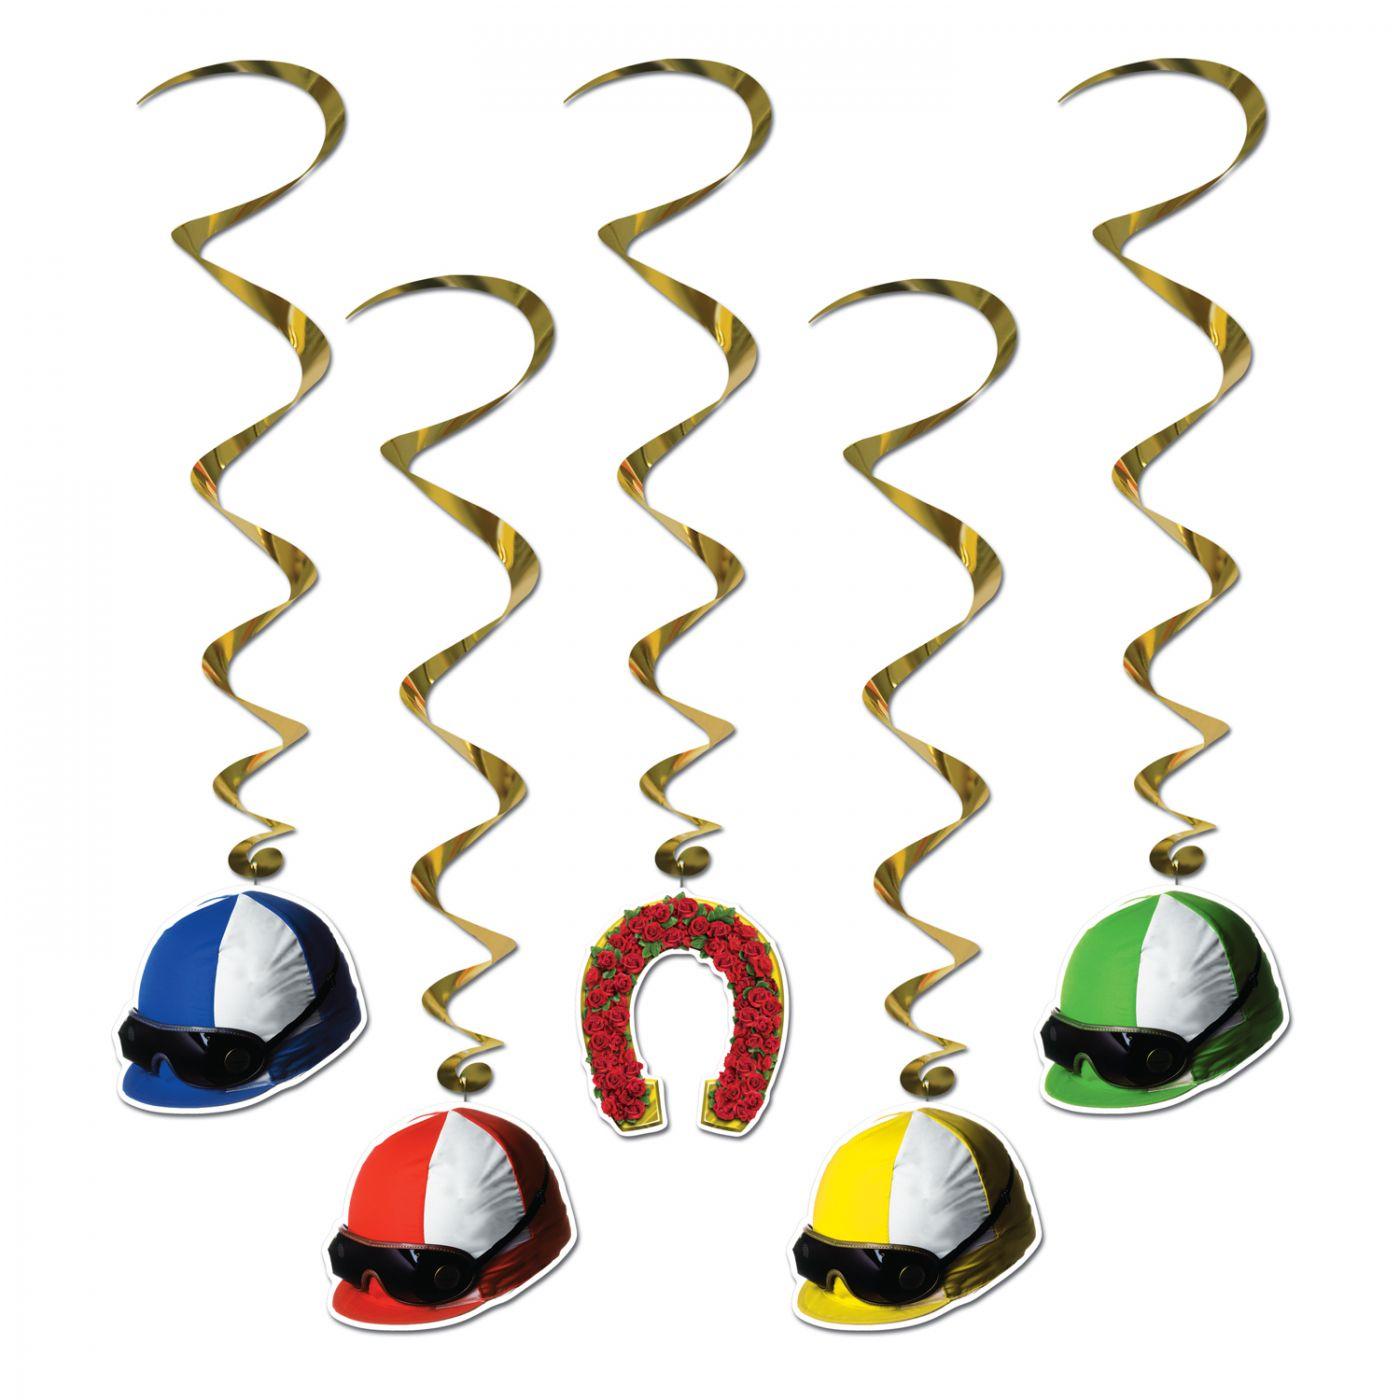 Jockey Helmet Whirls (6) image